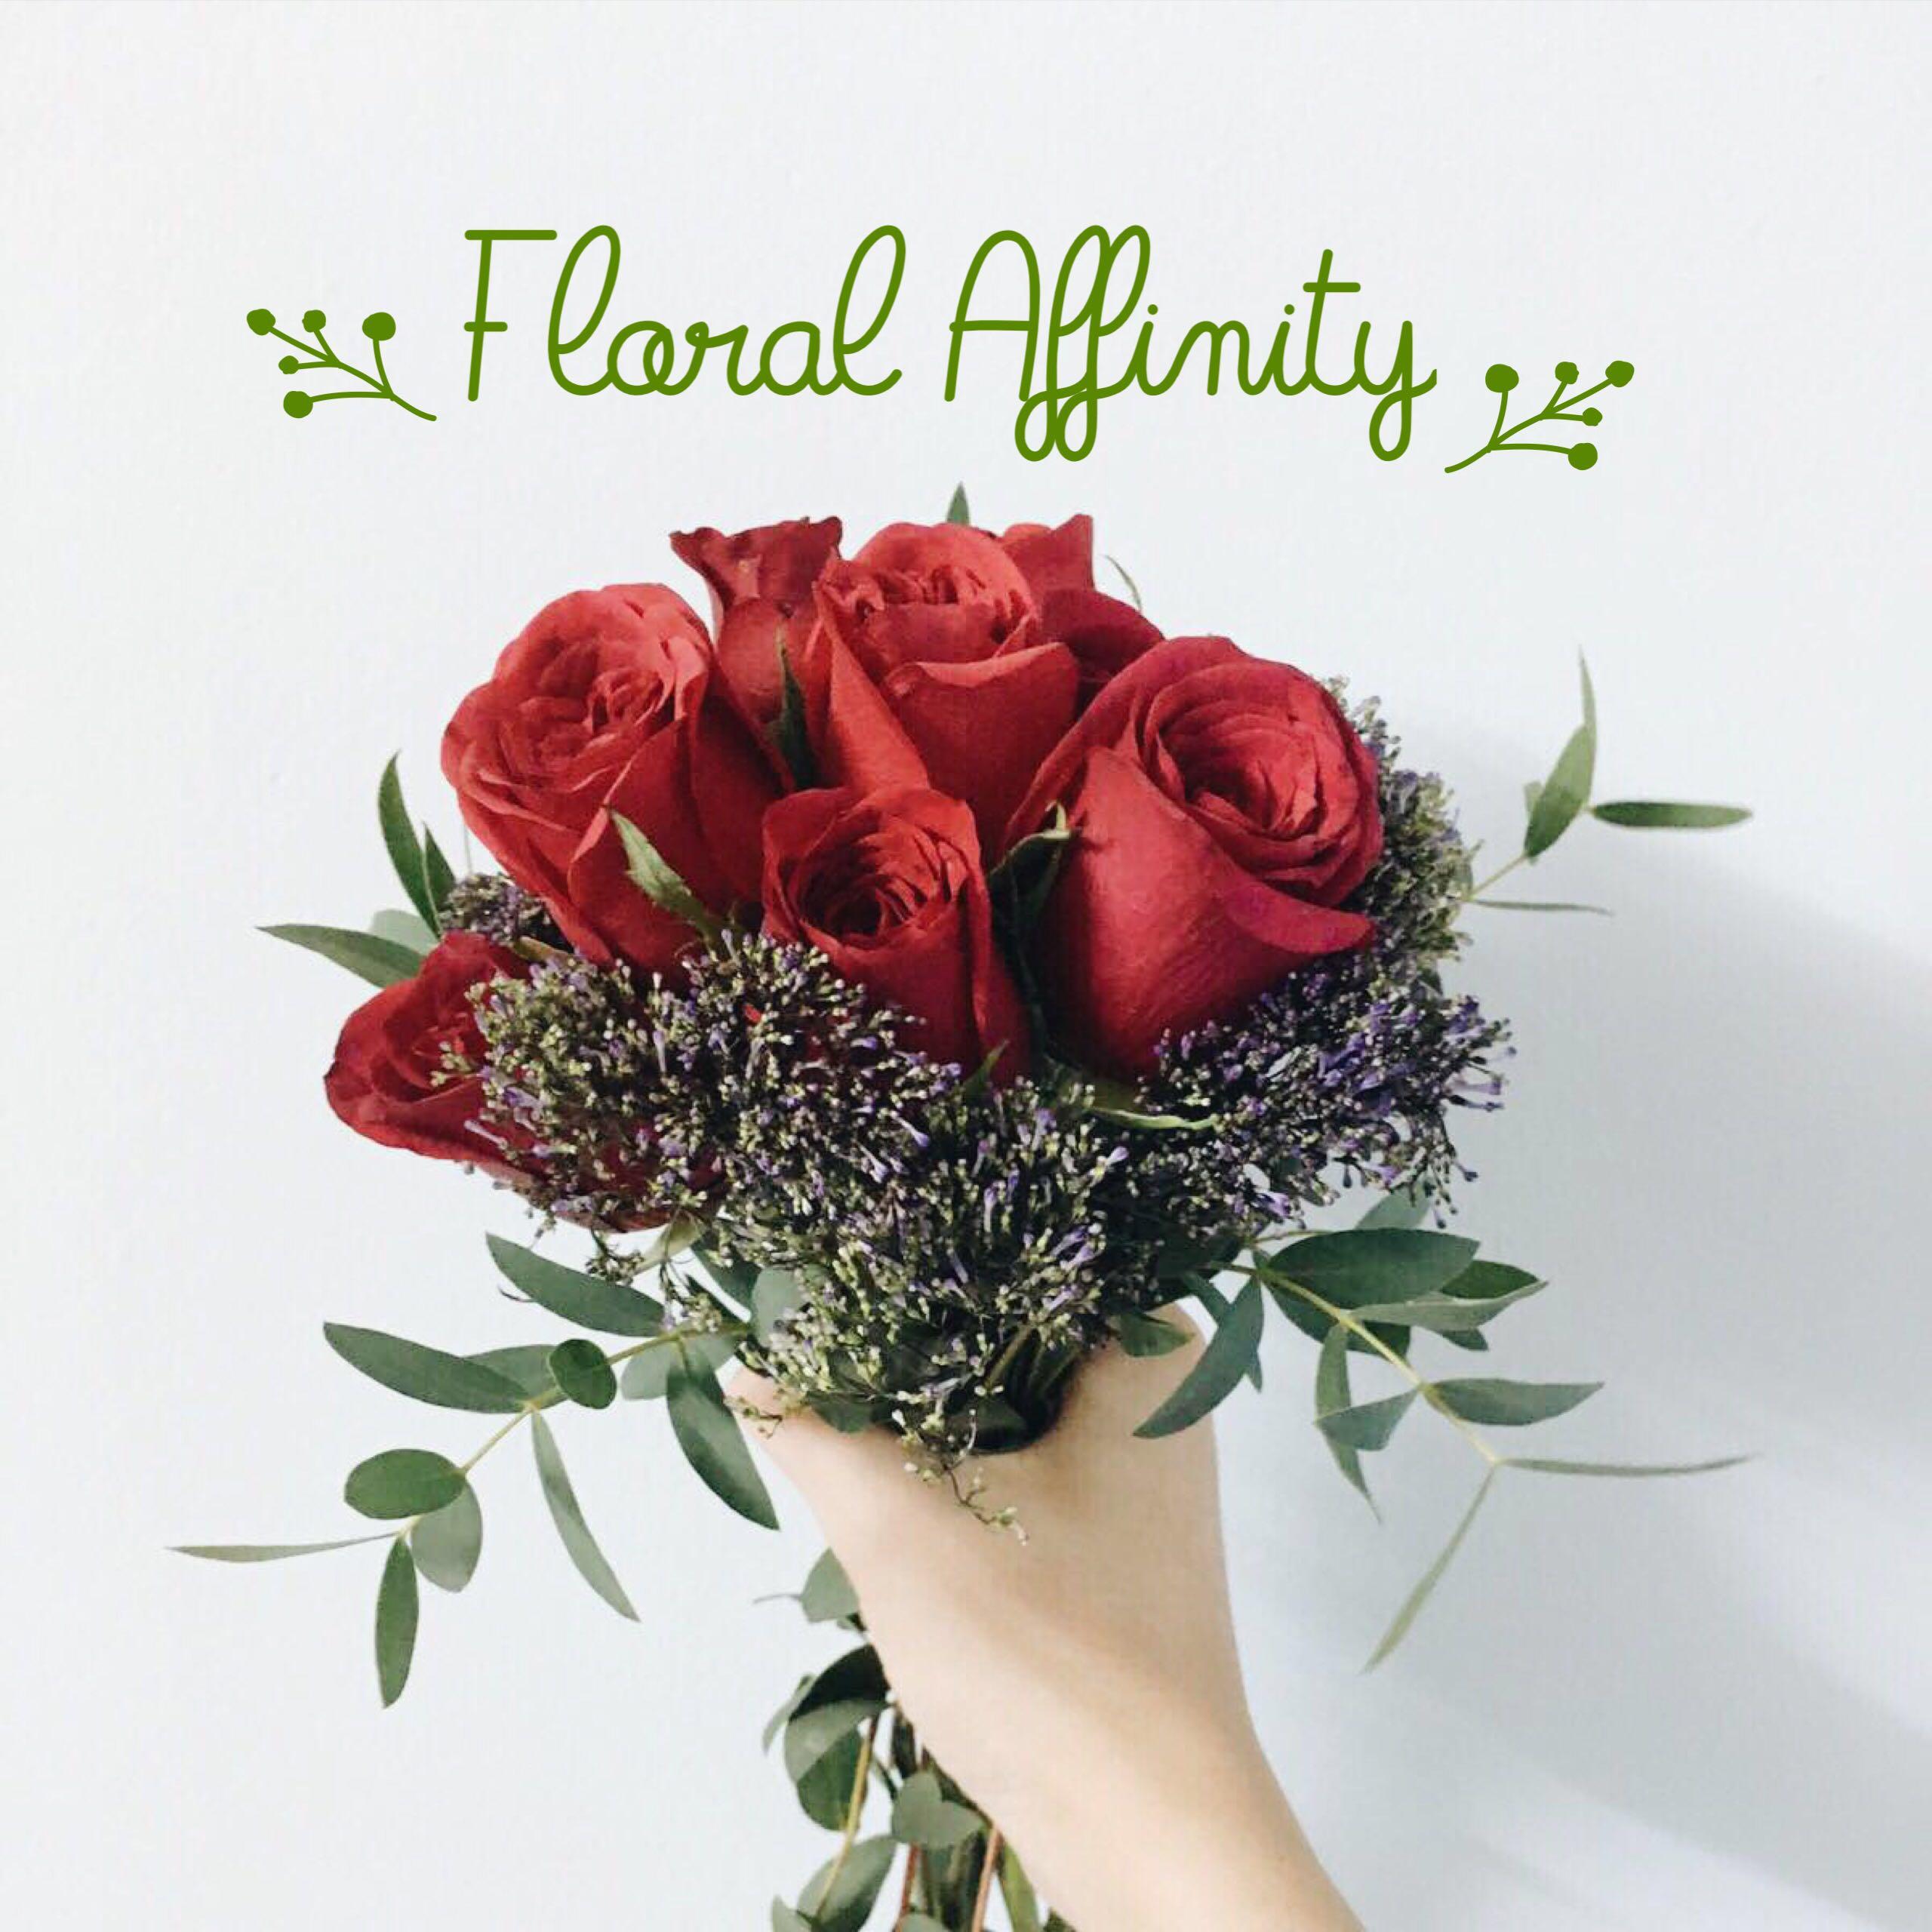 floralaffinity